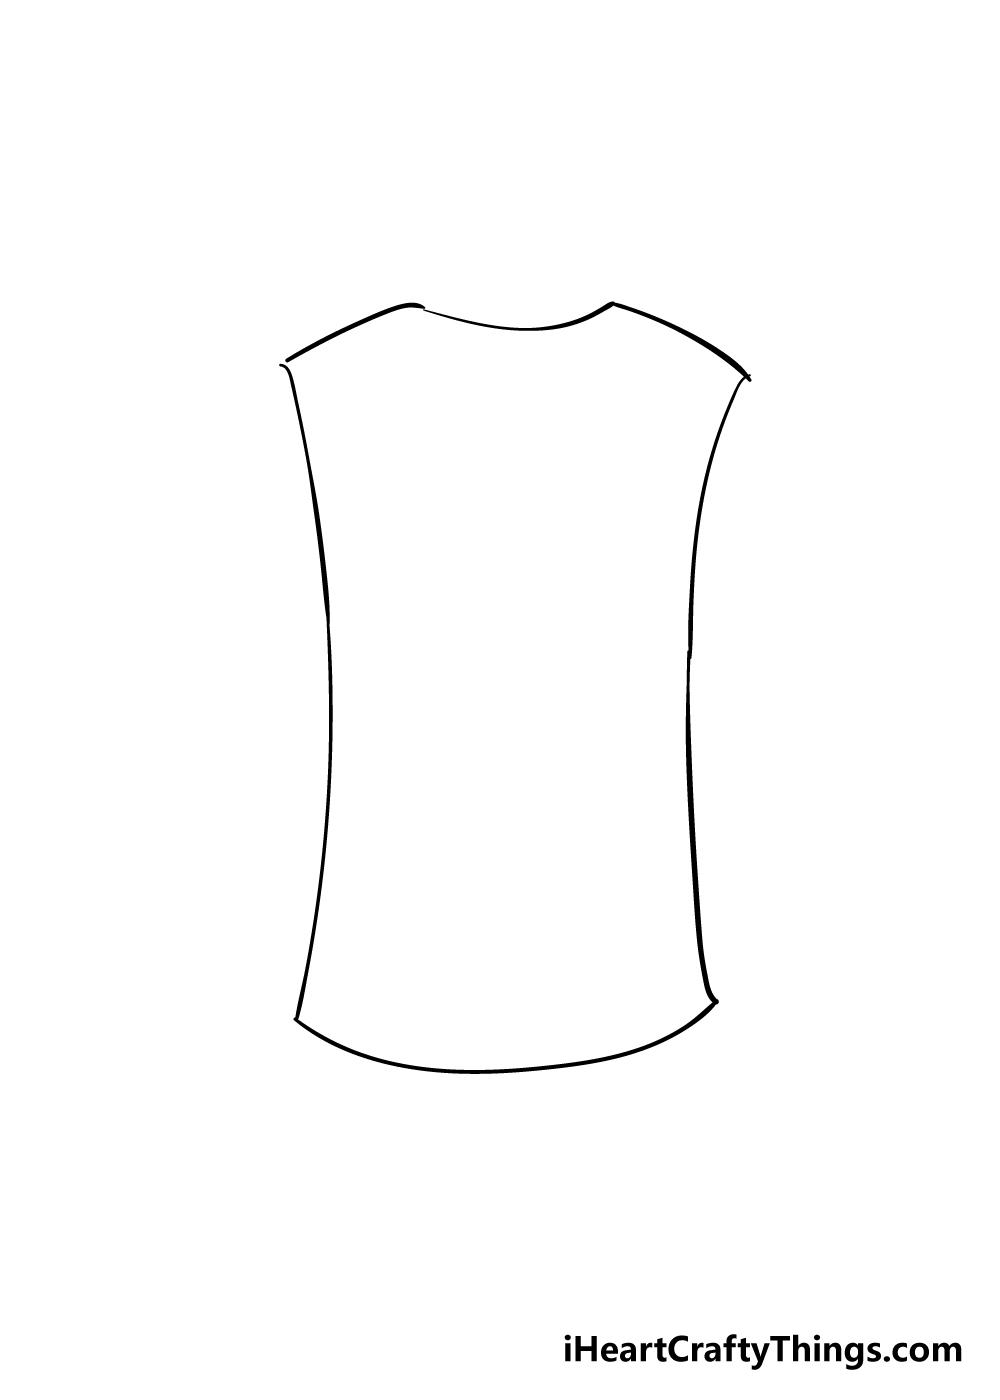 shirt drawing step 2